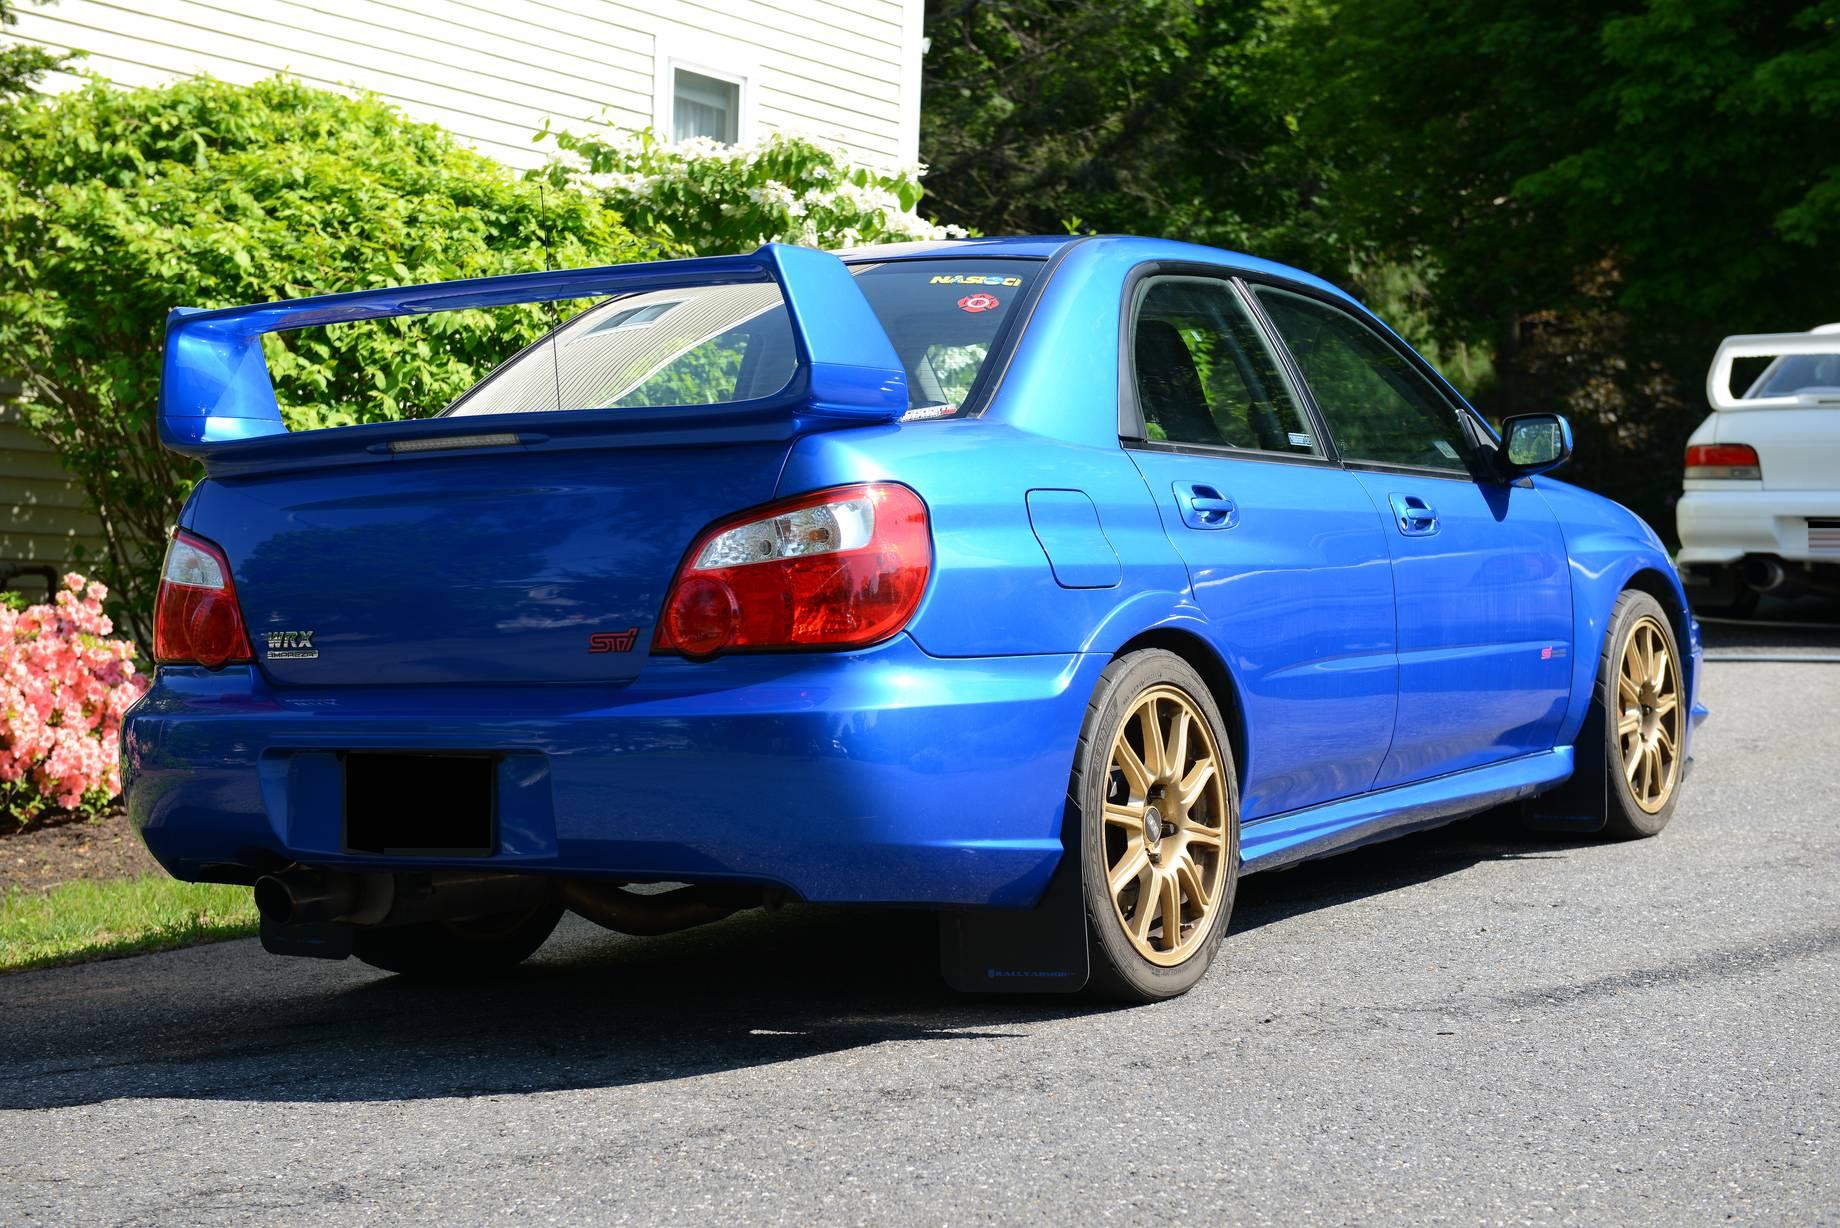 Modified Subaru STi – Clean and Track-Ready